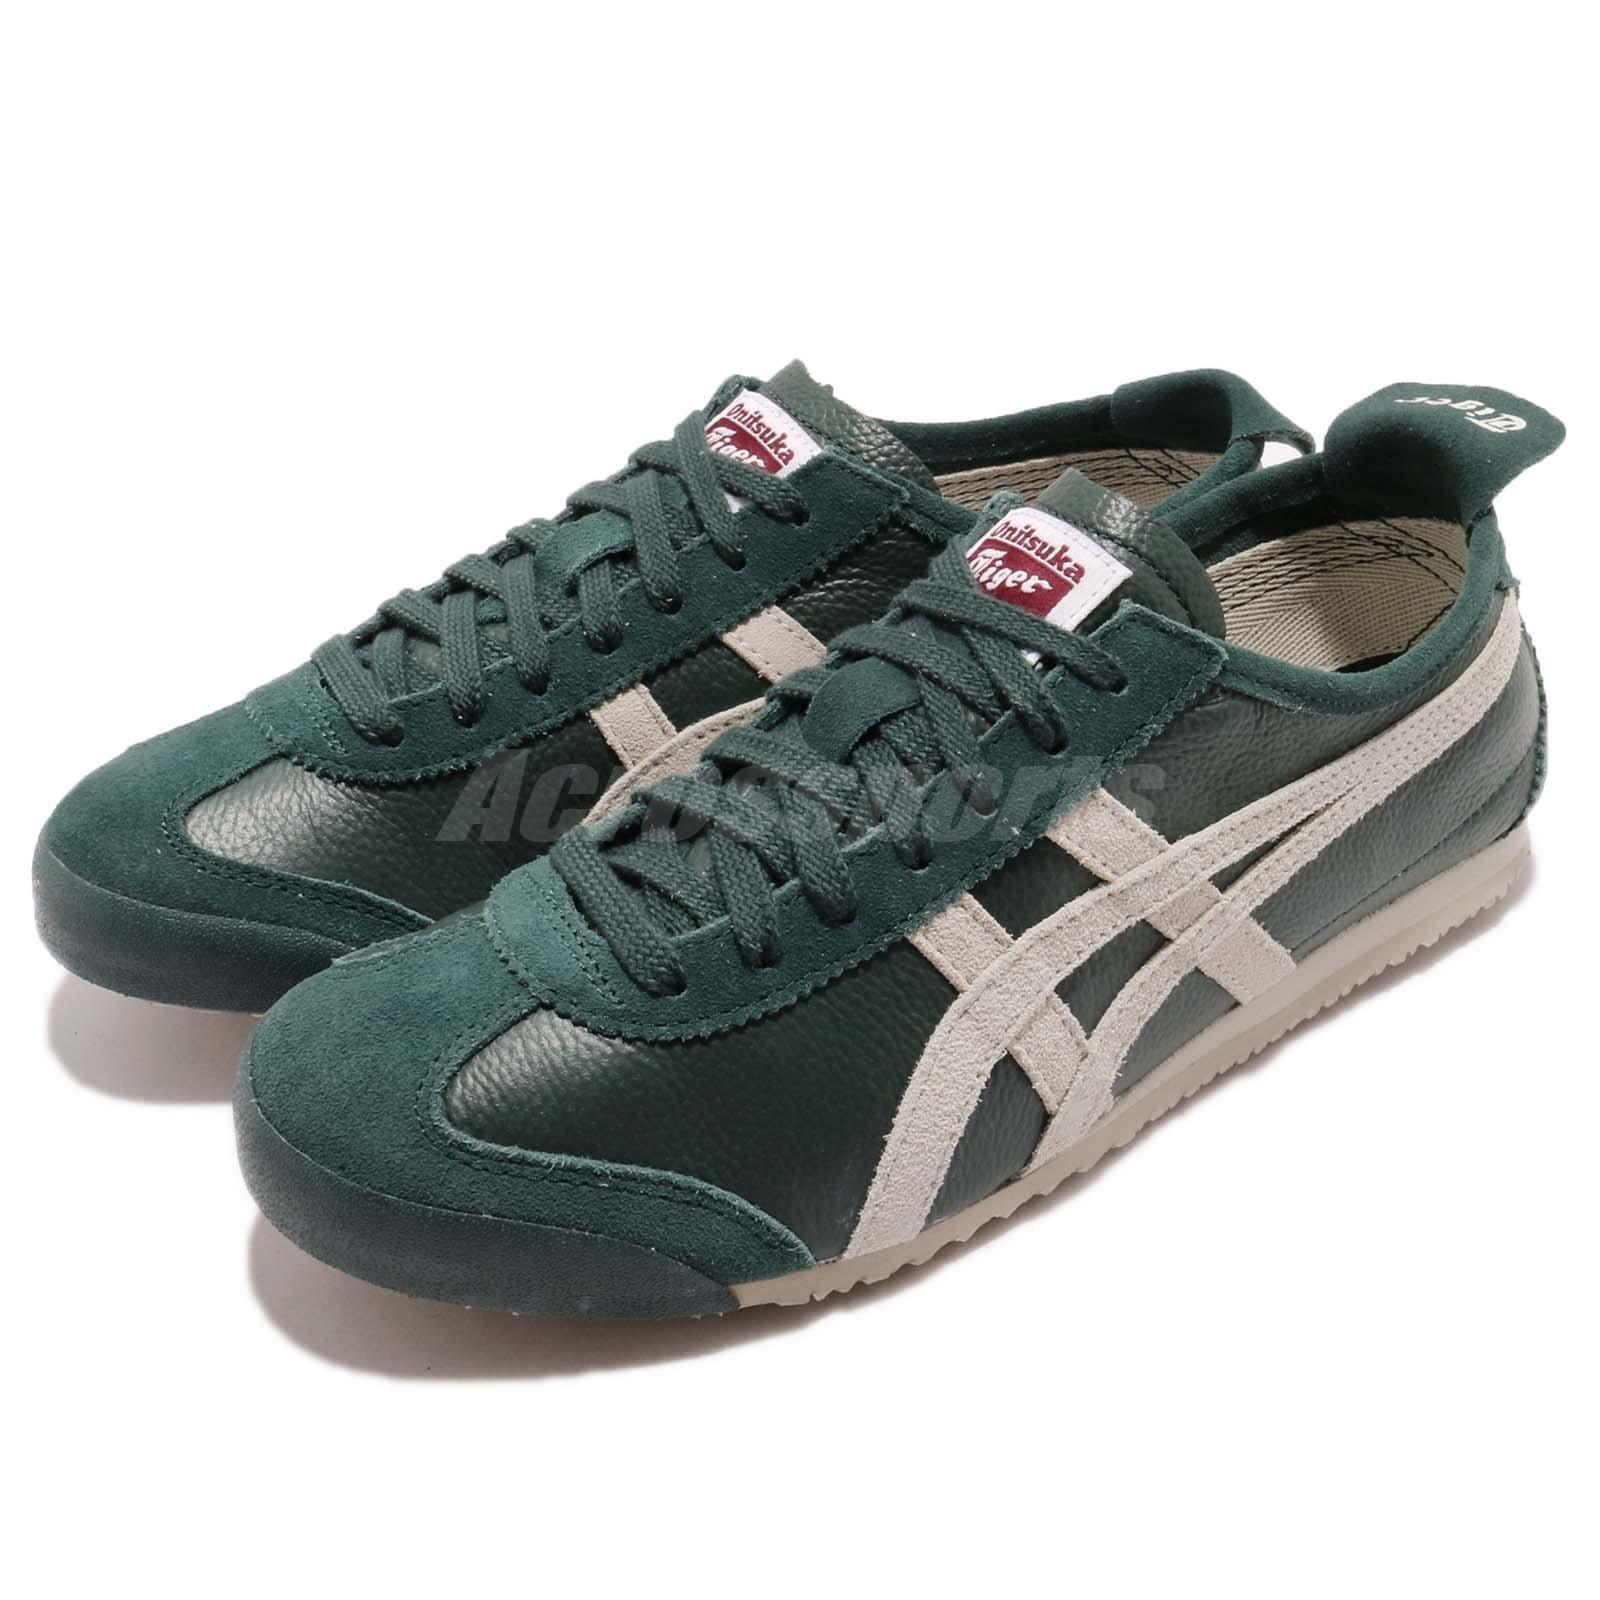 Asics Onitsuka Tiger Mexico 66 Vin Green Birch Men Running shoes D2J4L-8502